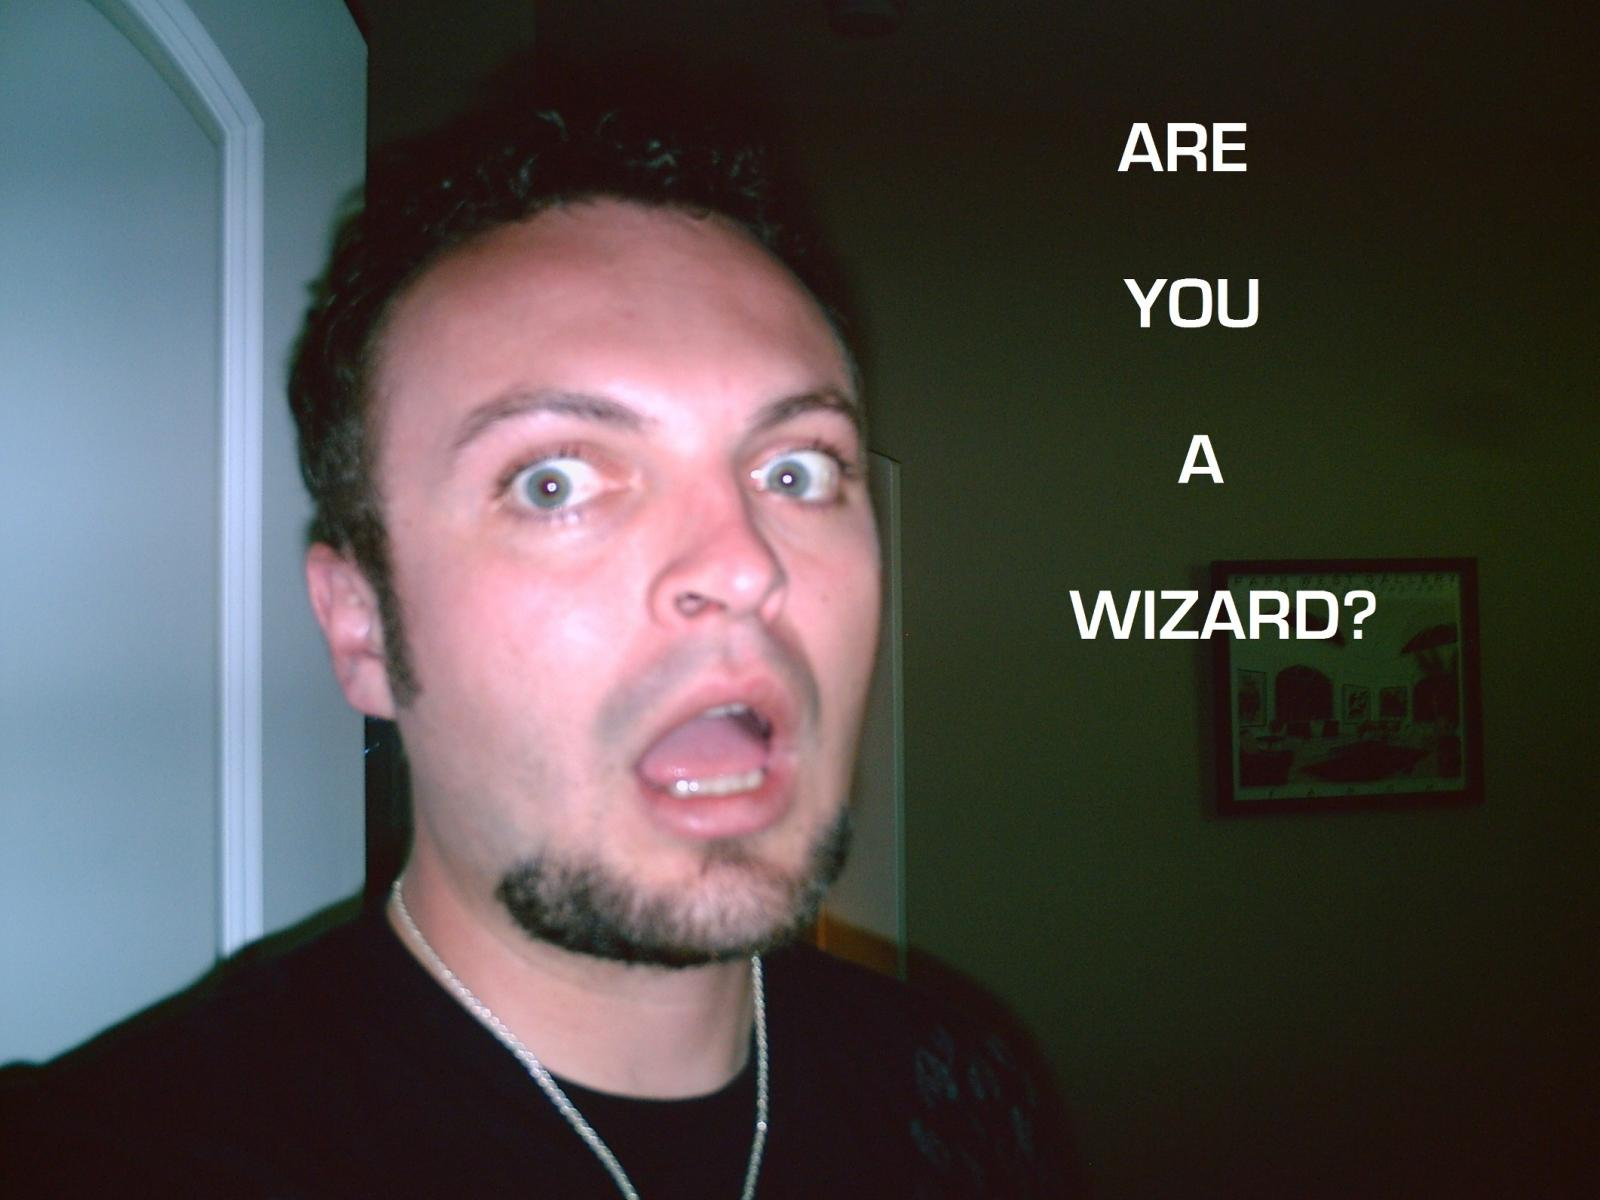 R U a WIZARD?!